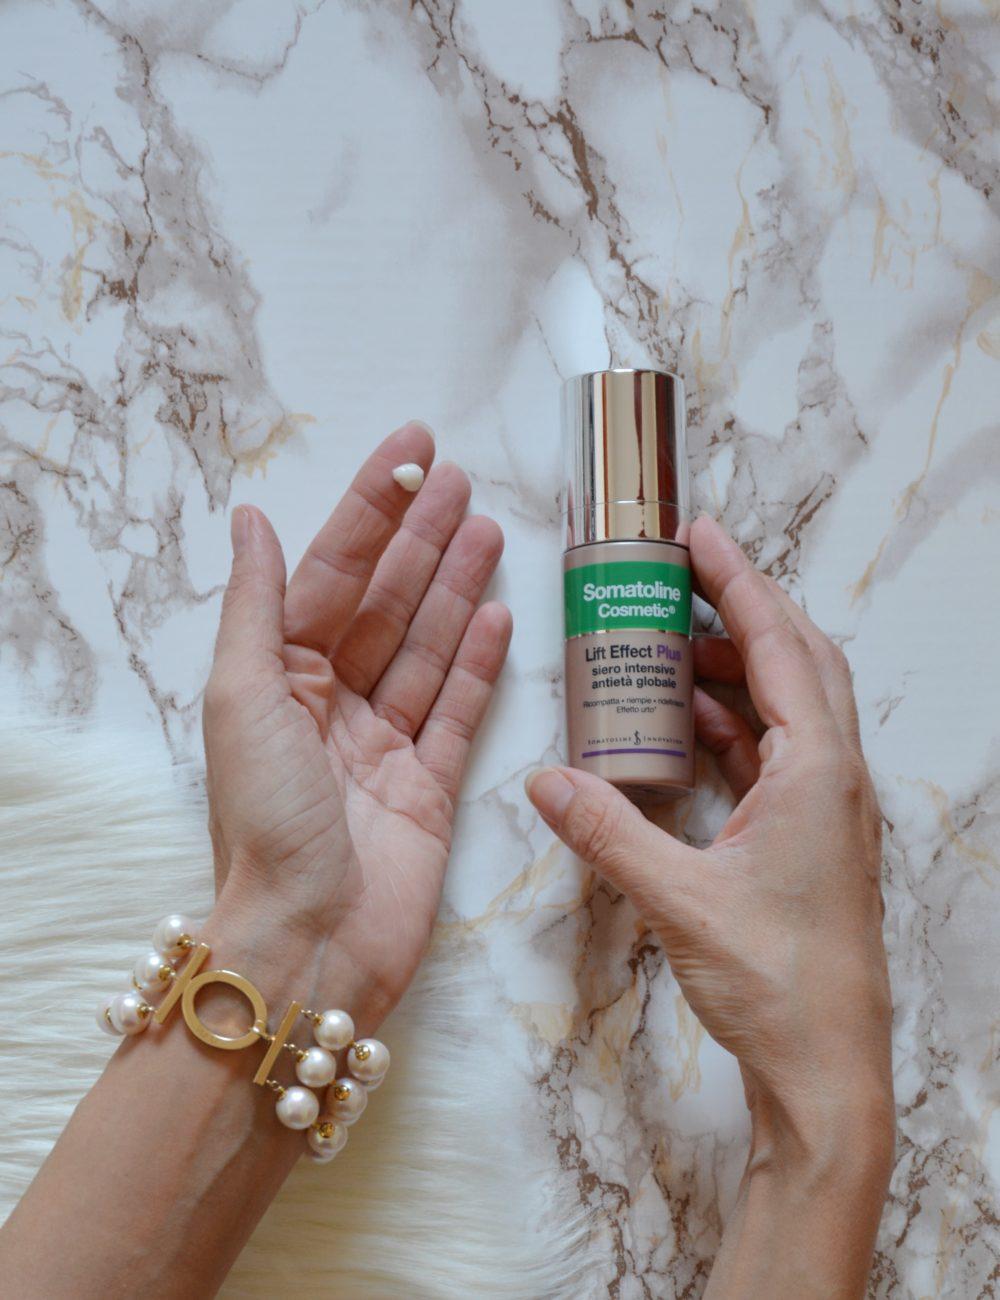 Siero Intensivo Antietà Globale Lift Effect Plus Somatoline Cosmetic